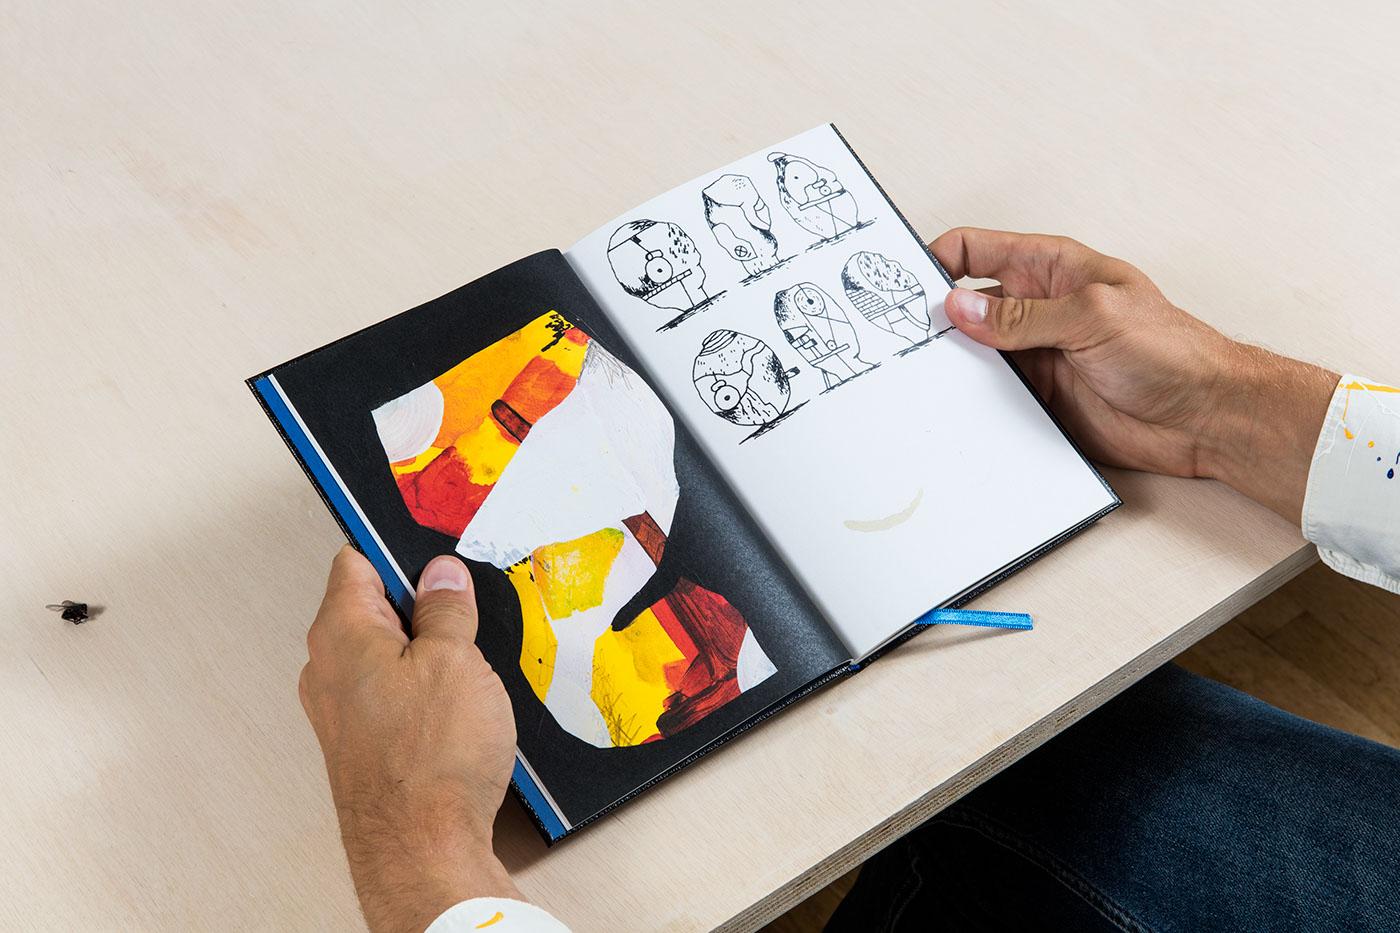 Ekta Is The Moniker Used By Swedish Artist Daniel Götesson (b. 1978).  Artist First, But Also Animator, Sculptor, Designer And Illustrator, Ekta  Has Been ...